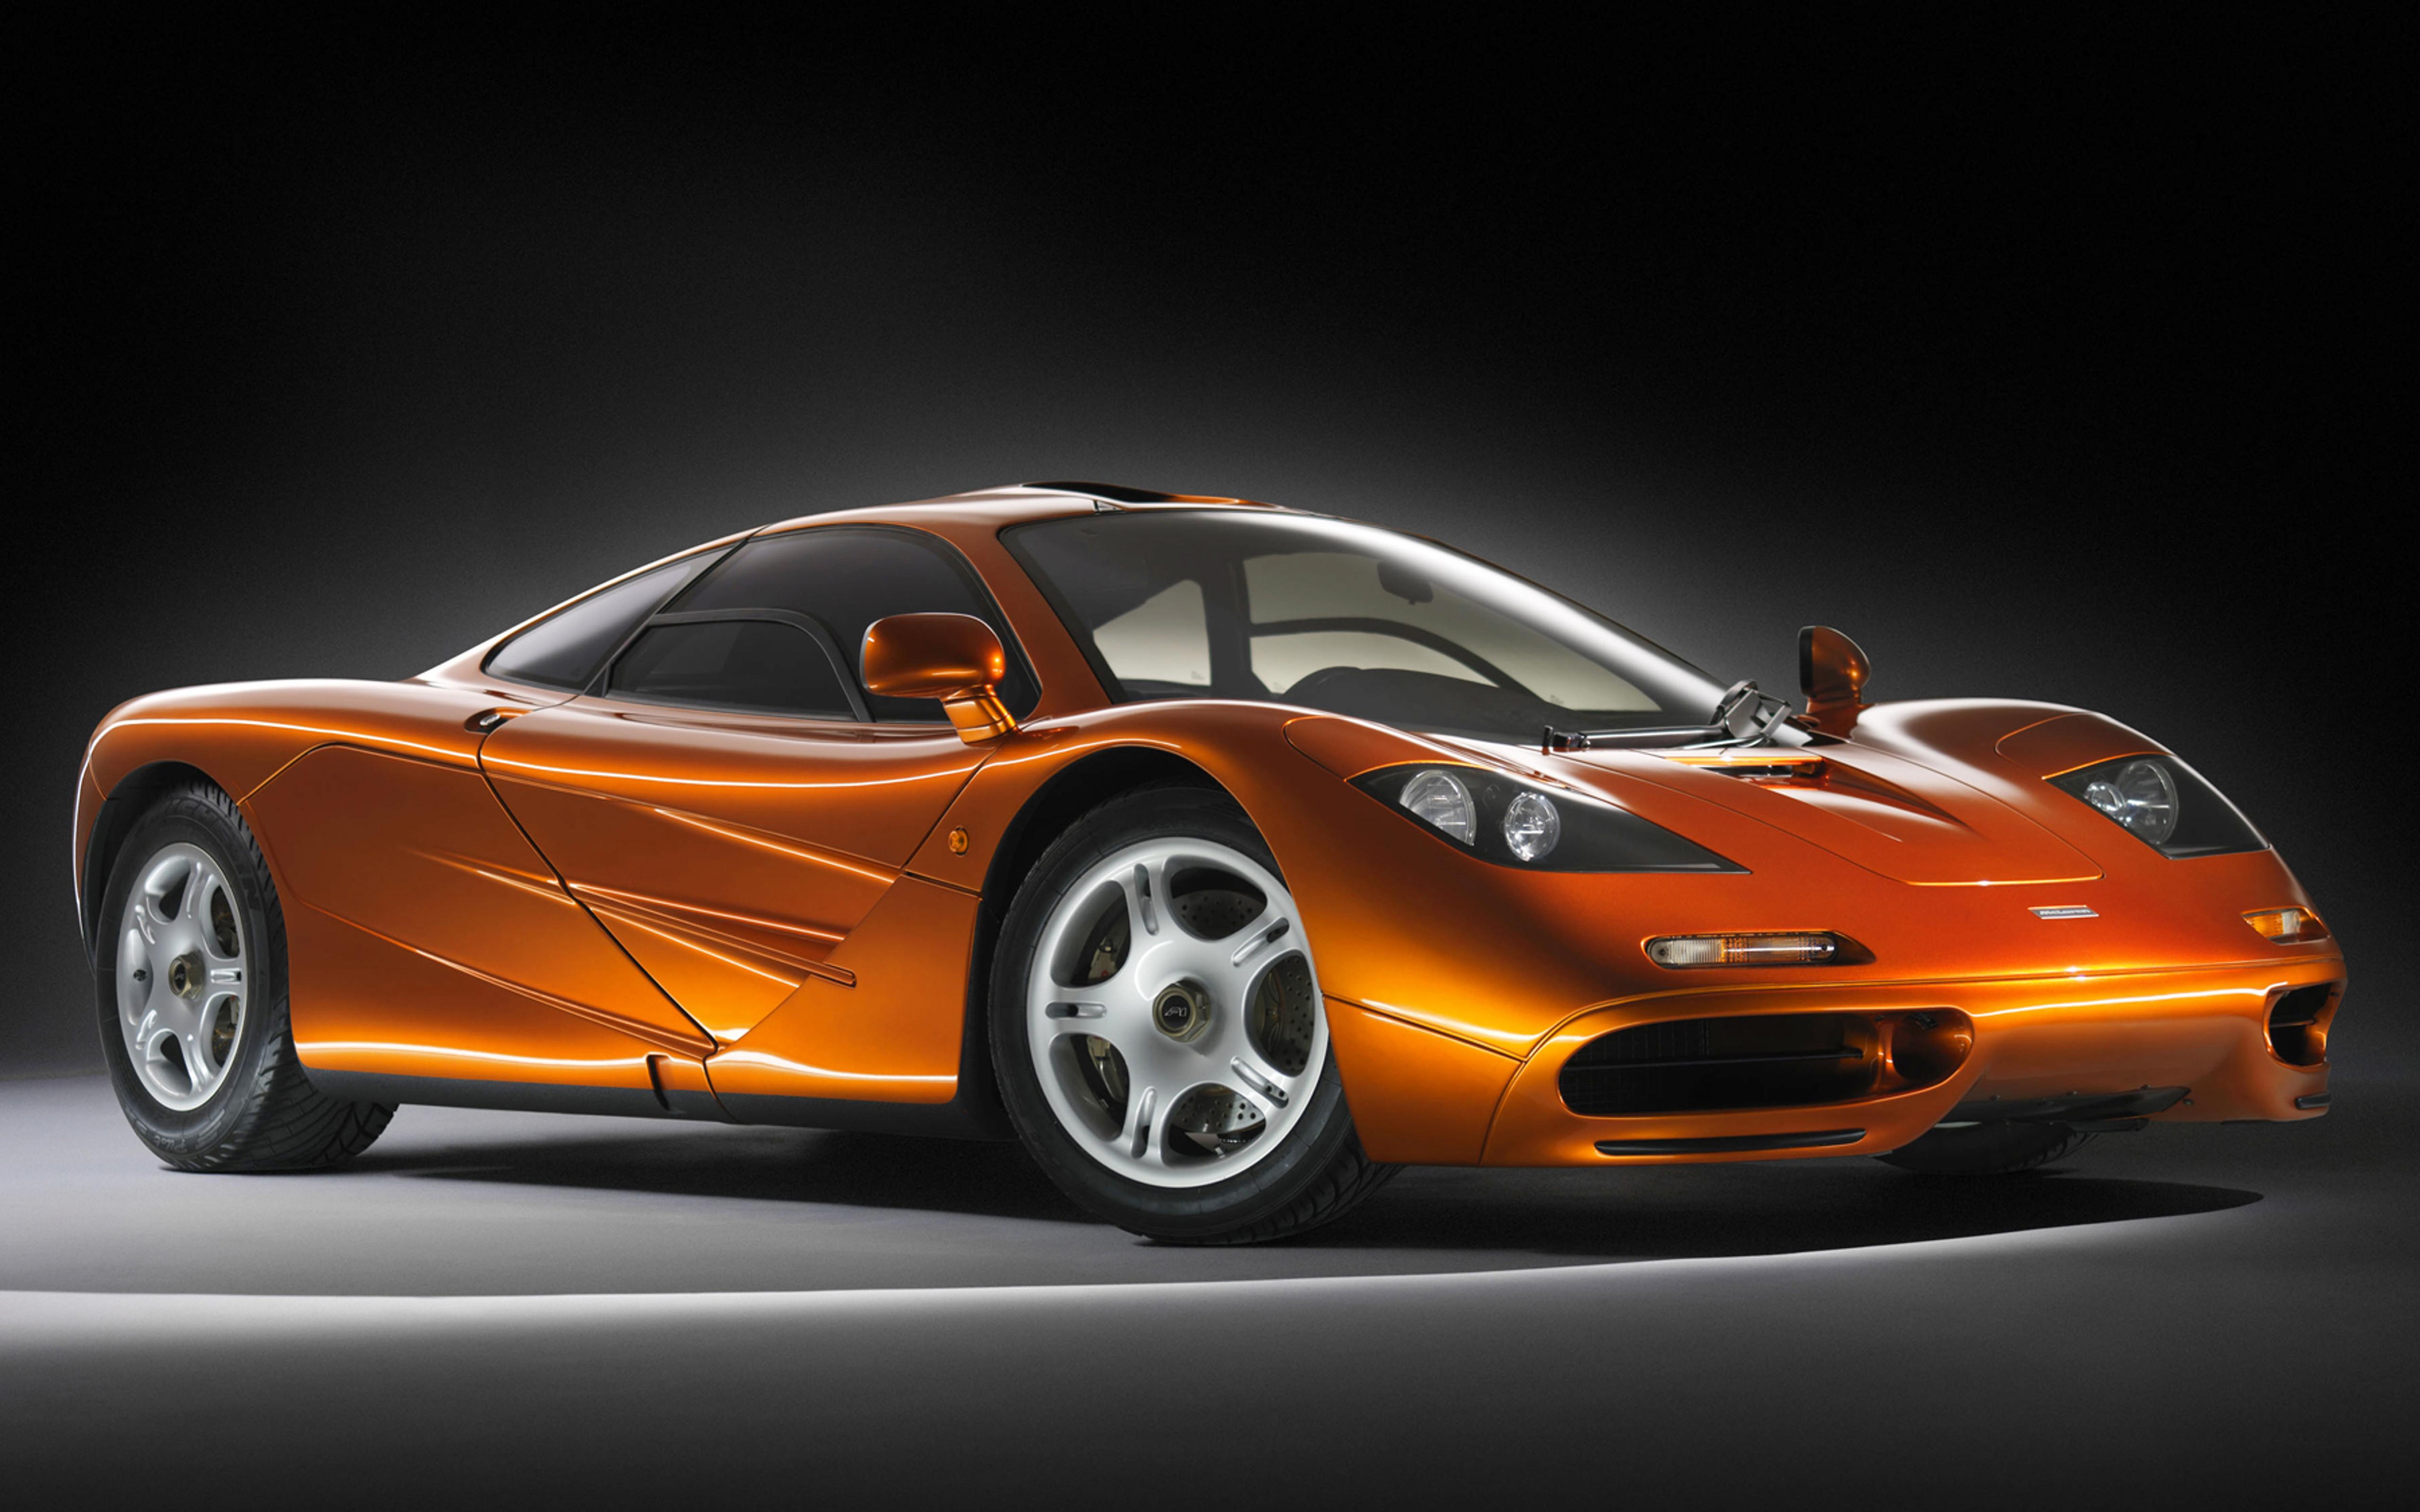 orange mclaren f1 tuned sport car wallpaper download 5120x3200. Black Bedroom Furniture Sets. Home Design Ideas